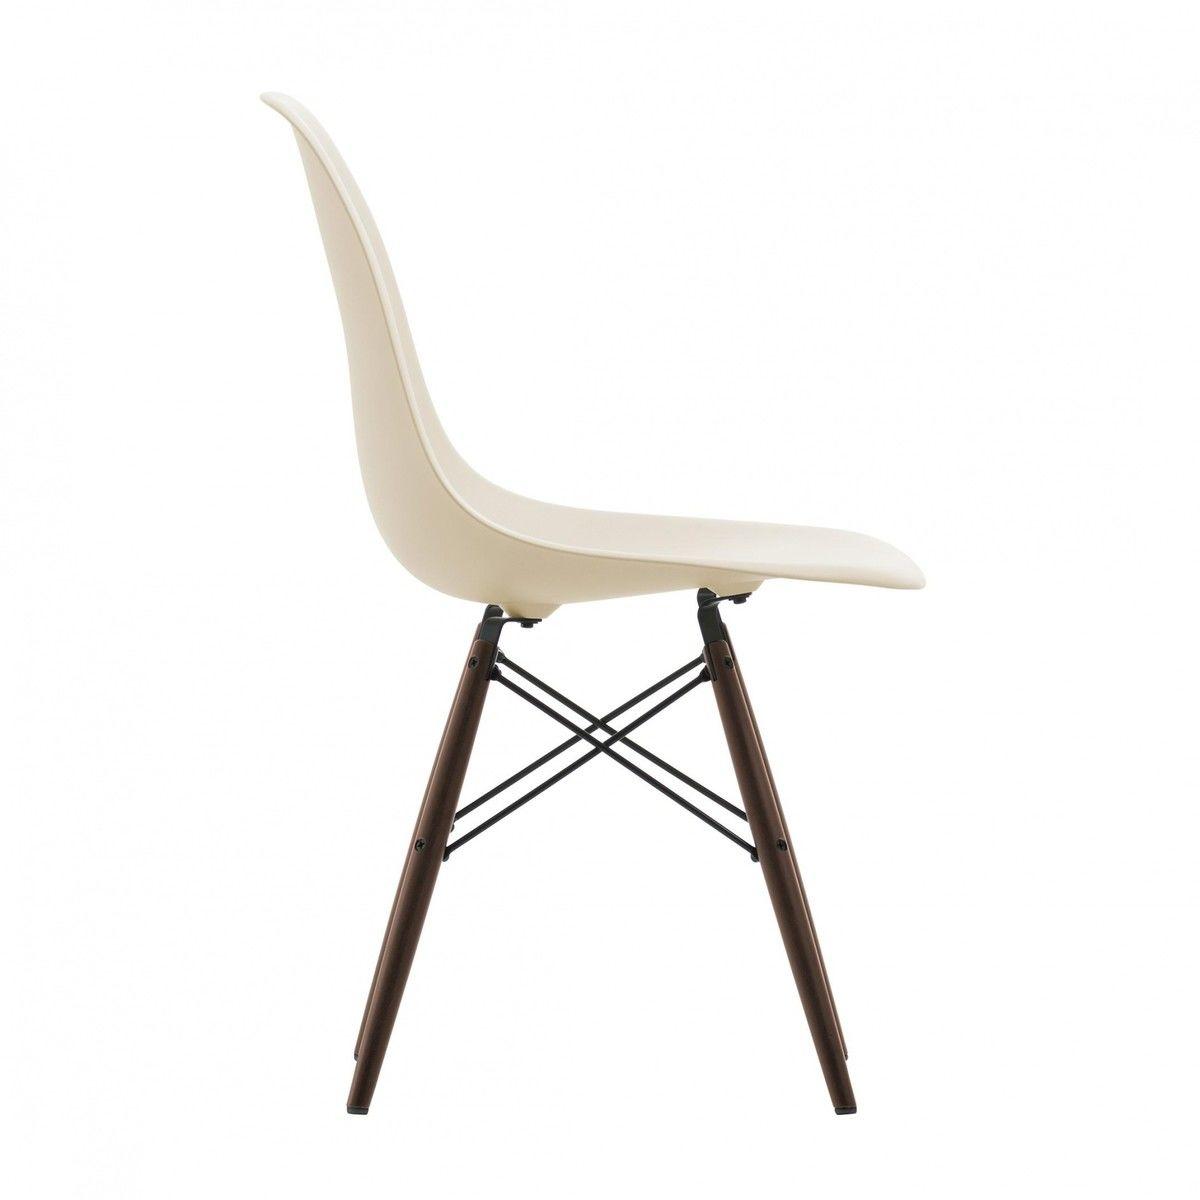 Eames plastic chair vitra - Vitra Eames Plastic Side Chair Dsw Ahorn Dunkel H41cm Creme Polypropylen Gestell